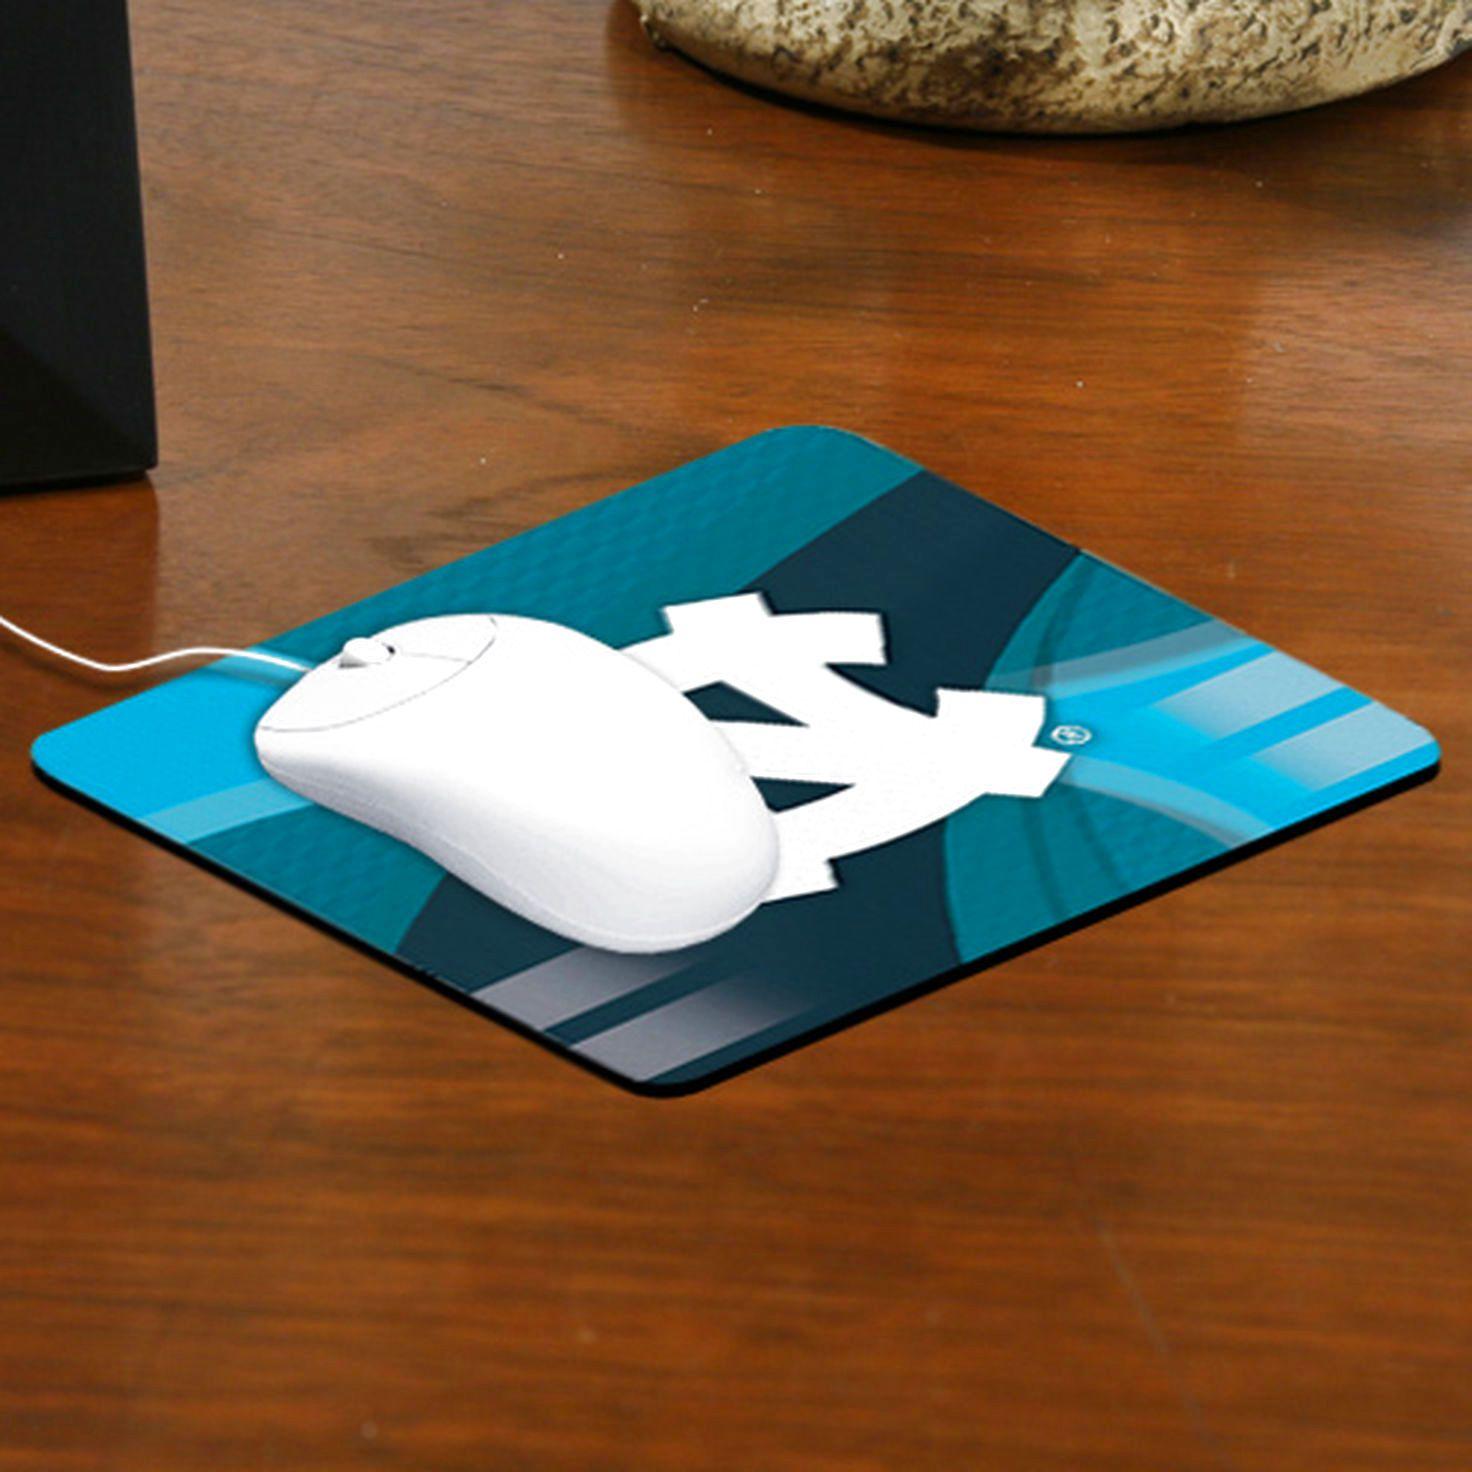 North Carolina Tar Heels (UNC) Sublimated Mousepad - $7.99